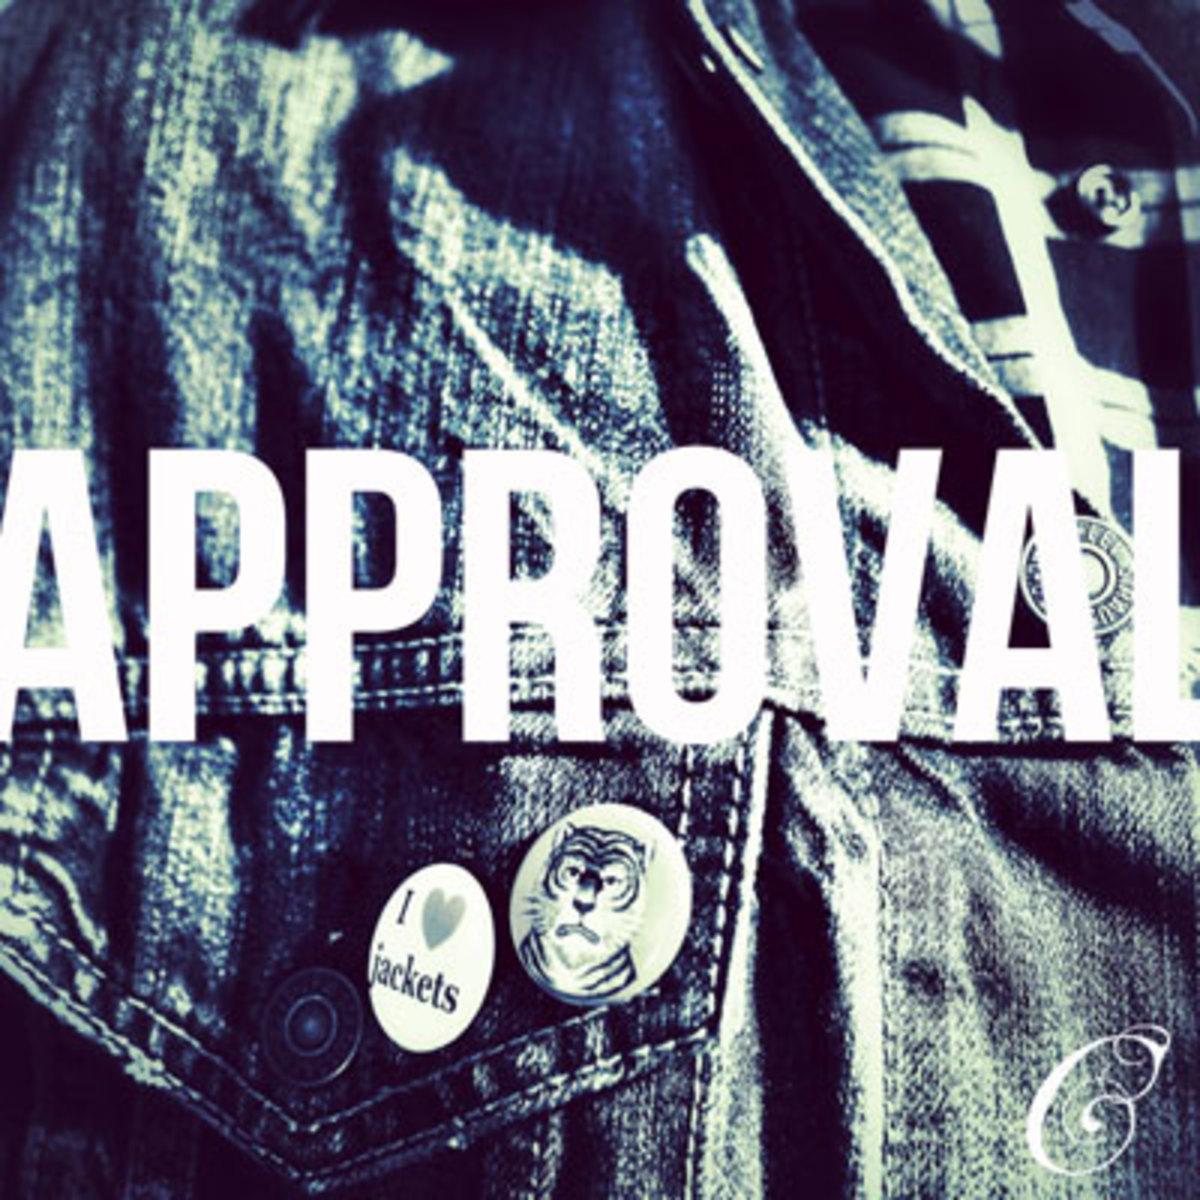 edge-approval.jpg